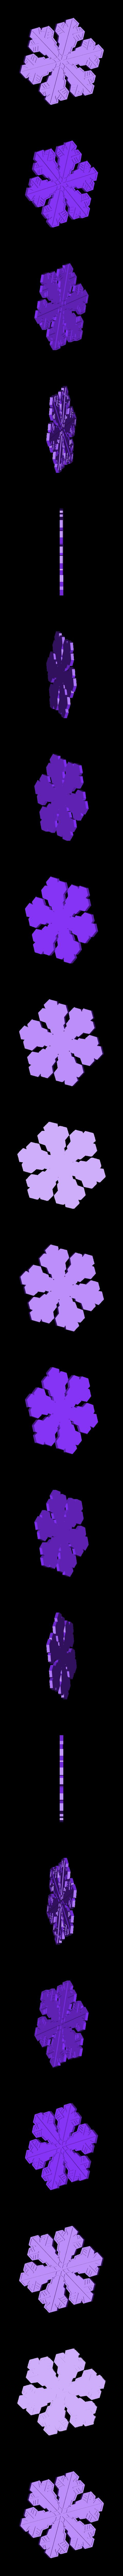 "snowflake_anna.stl Download free STL file Snowflake ""Anna"" • 3D print model, Opossums"